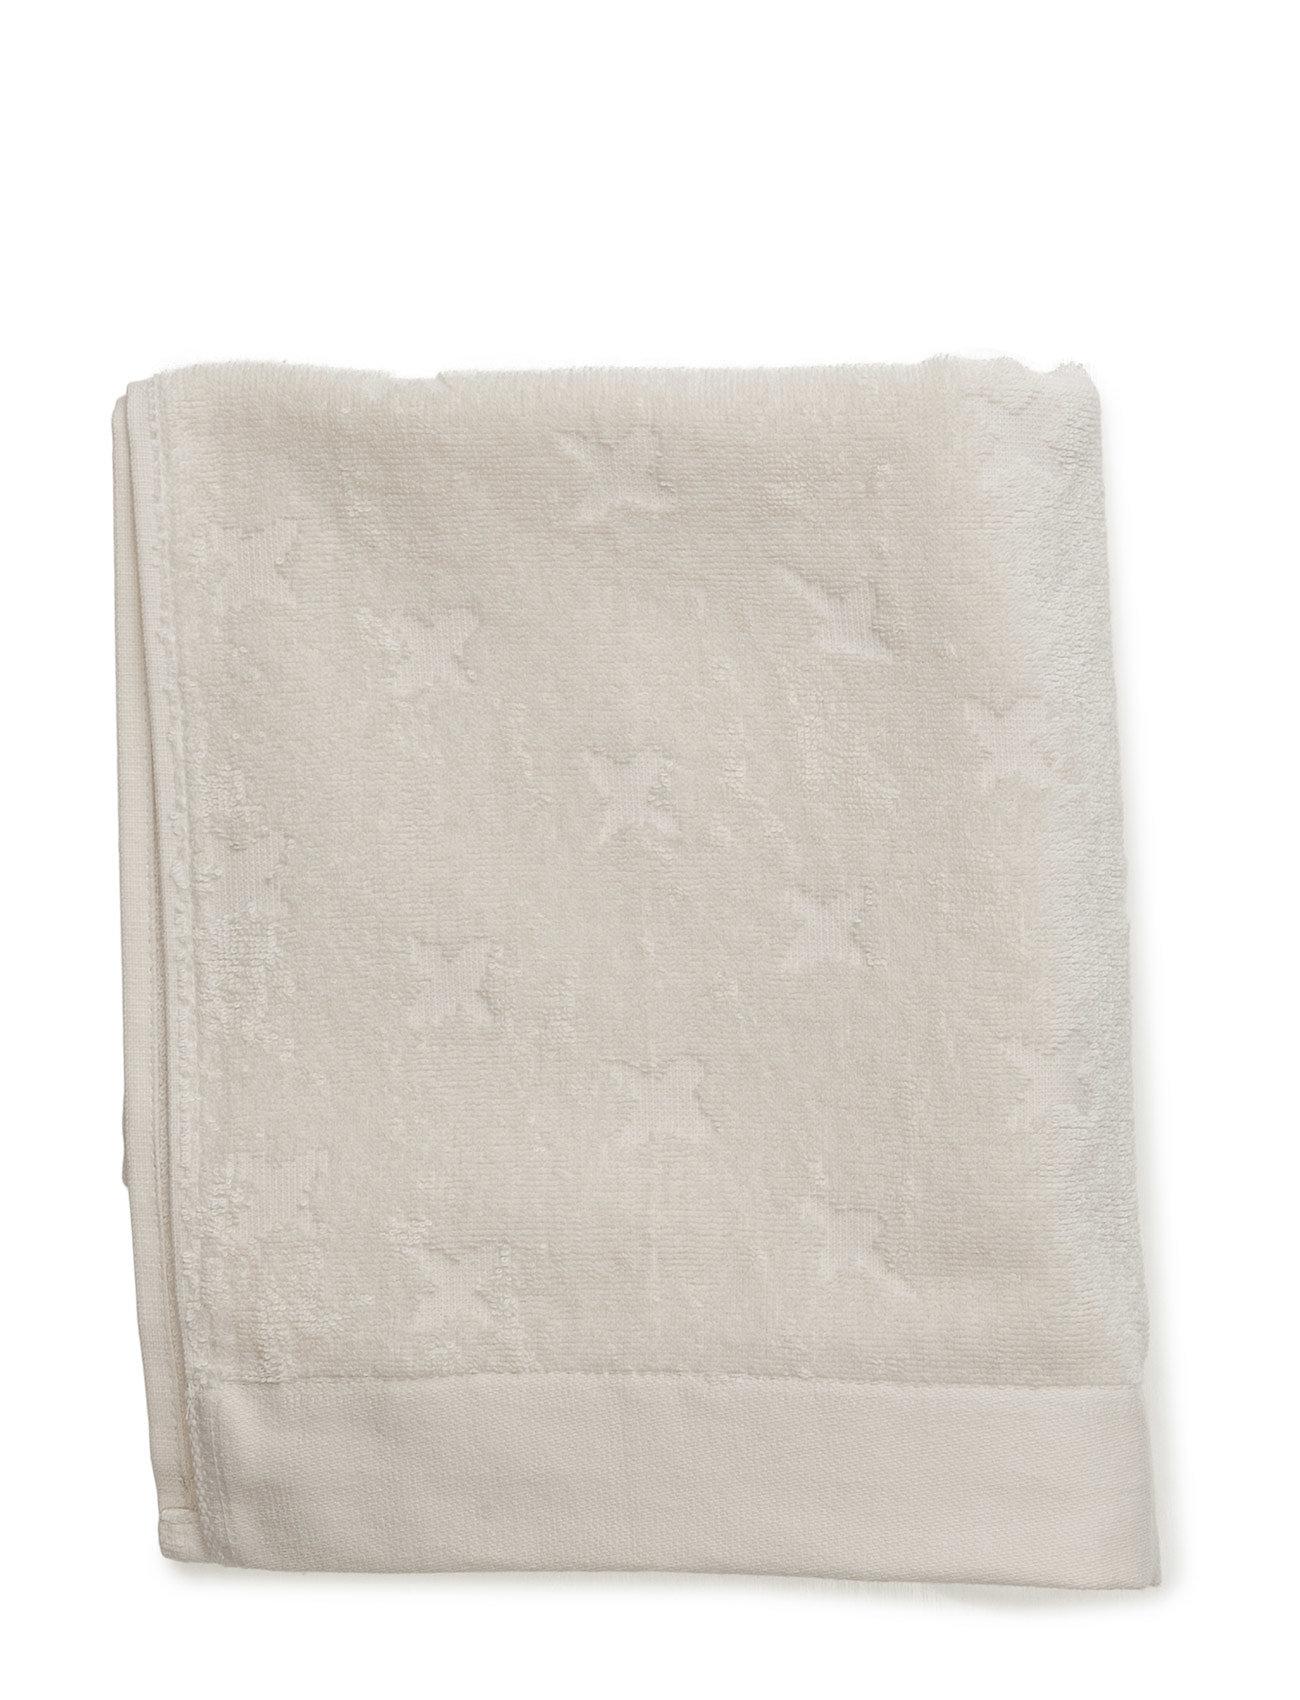 HandecruMüsli Green Towel Towel By Cotton 9H2IeWYED